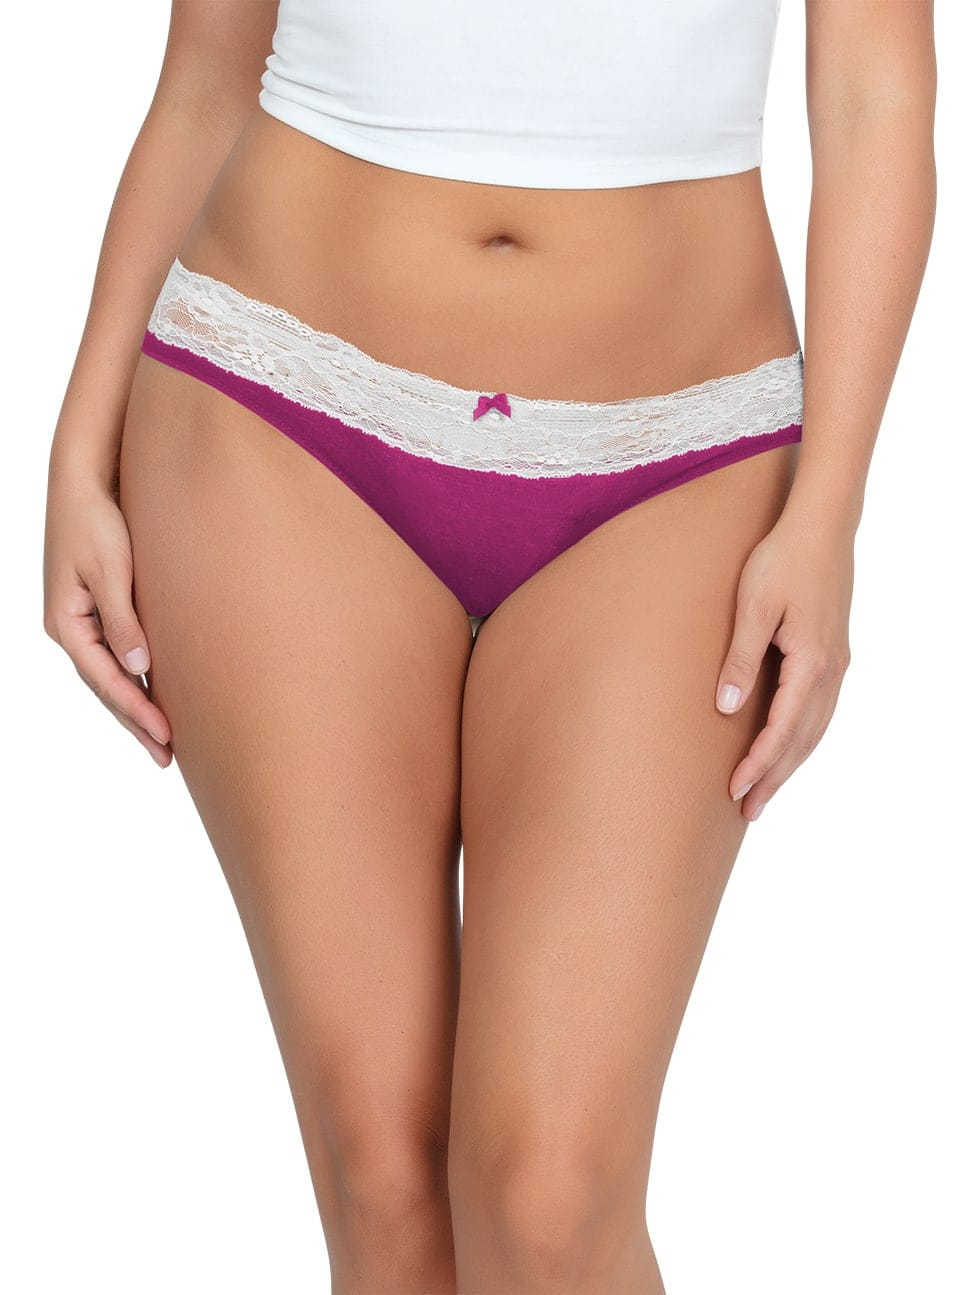 PARFAIT ParfaitPanty SoEssential BikiniPP303 WildPinkIvory Front - Parfait Panty So Essential Bikini- Wild Pink - PP303